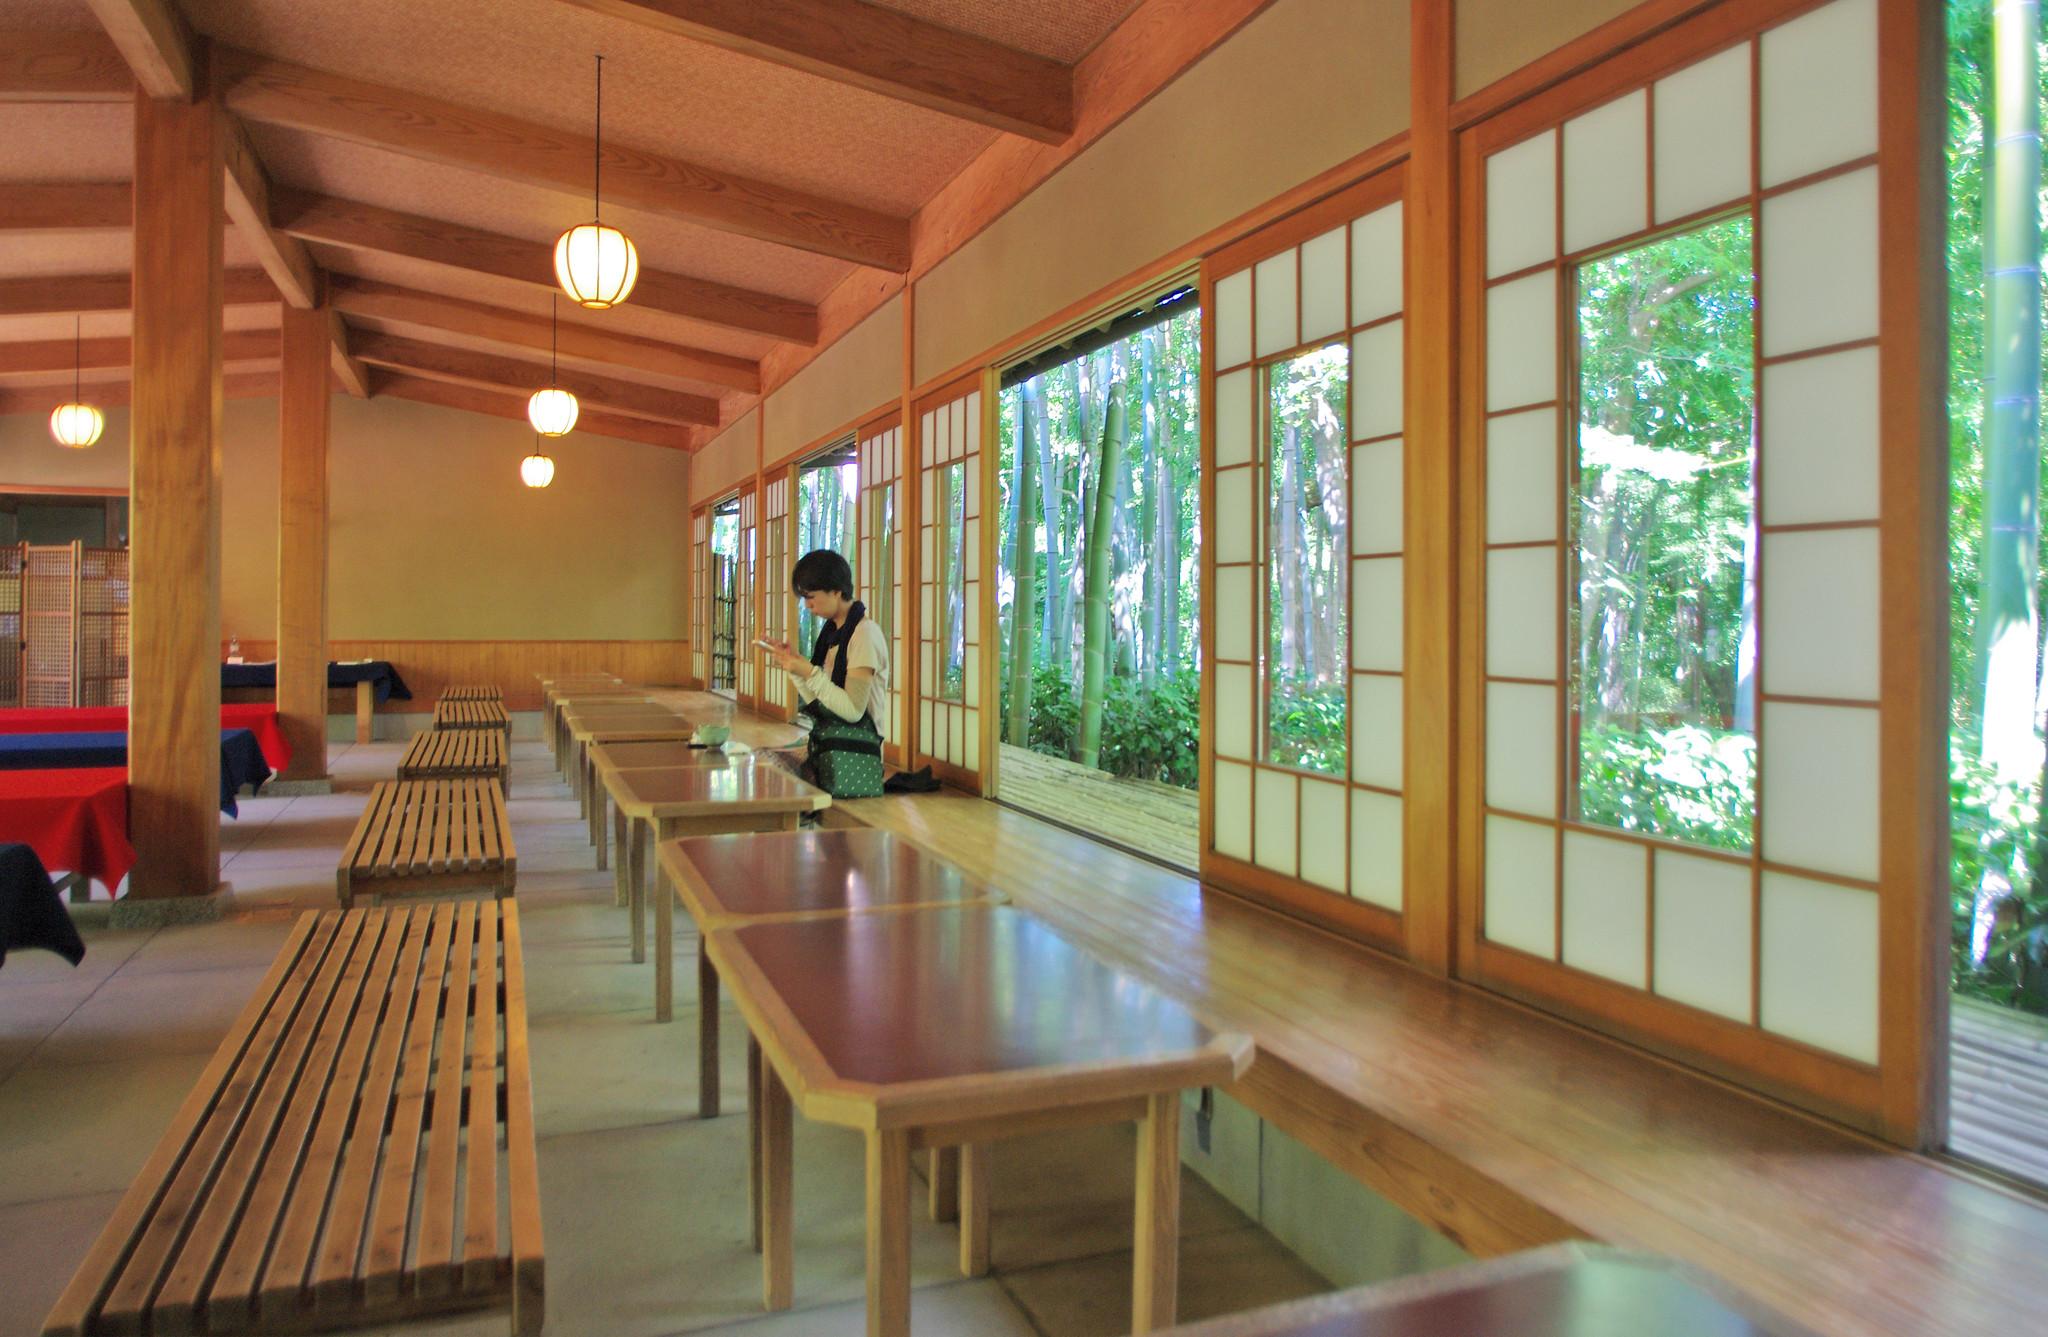 Ōkōchi Sansō tea room